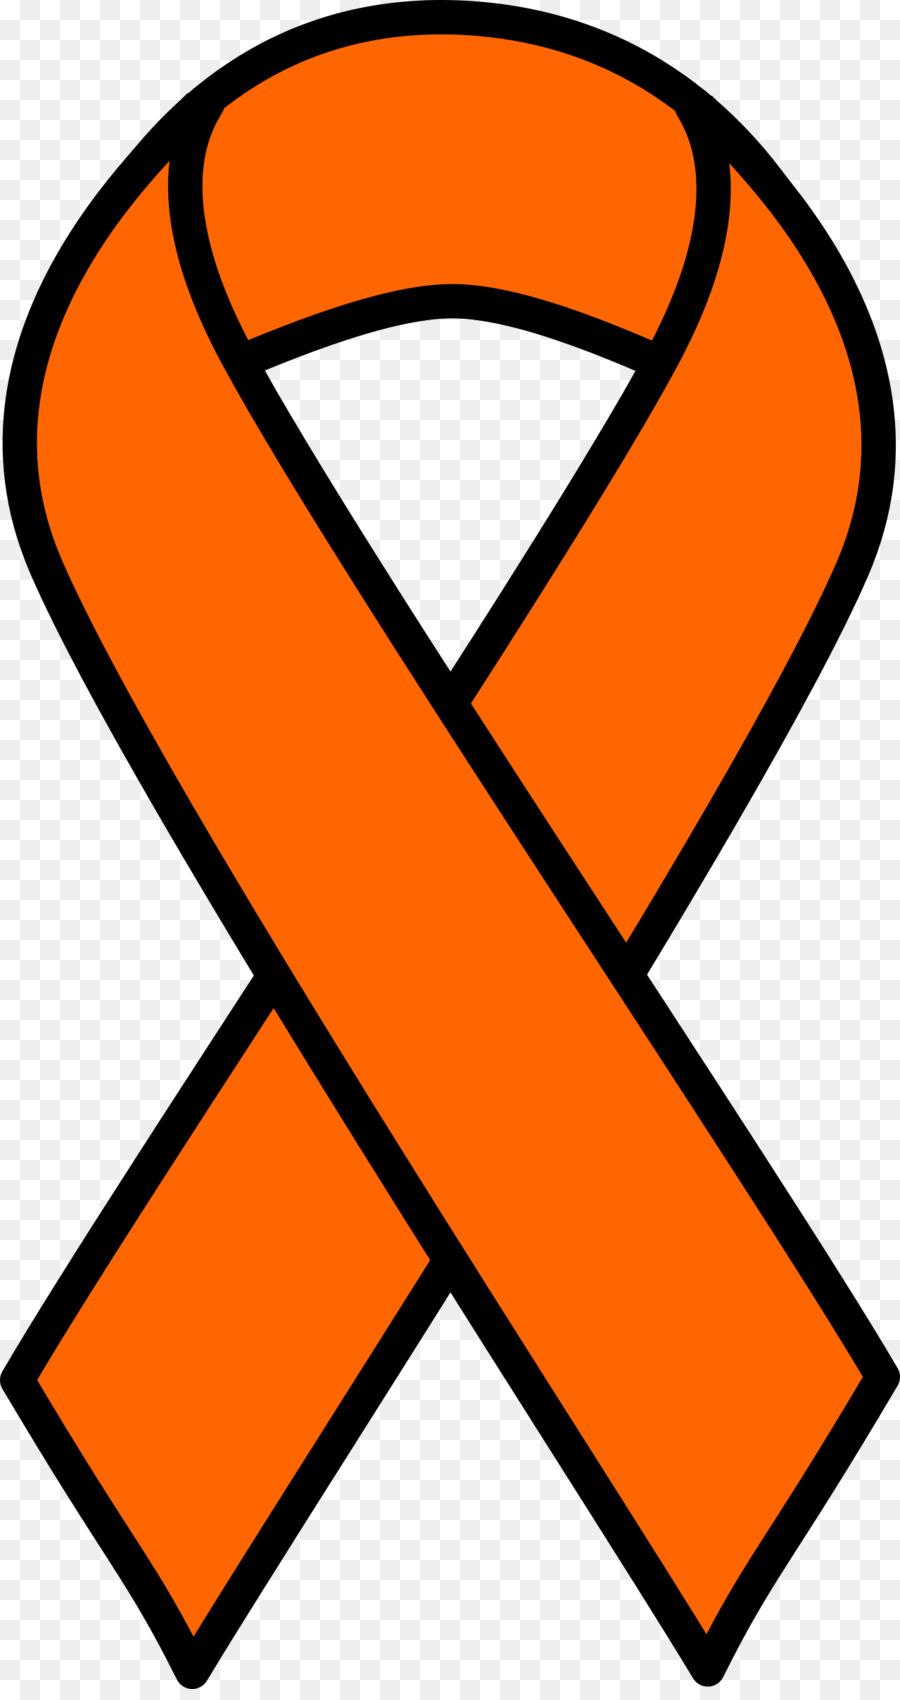 Fresh Orange Cancer Ribbon Clip Art Good Looking Yellow Transparent.